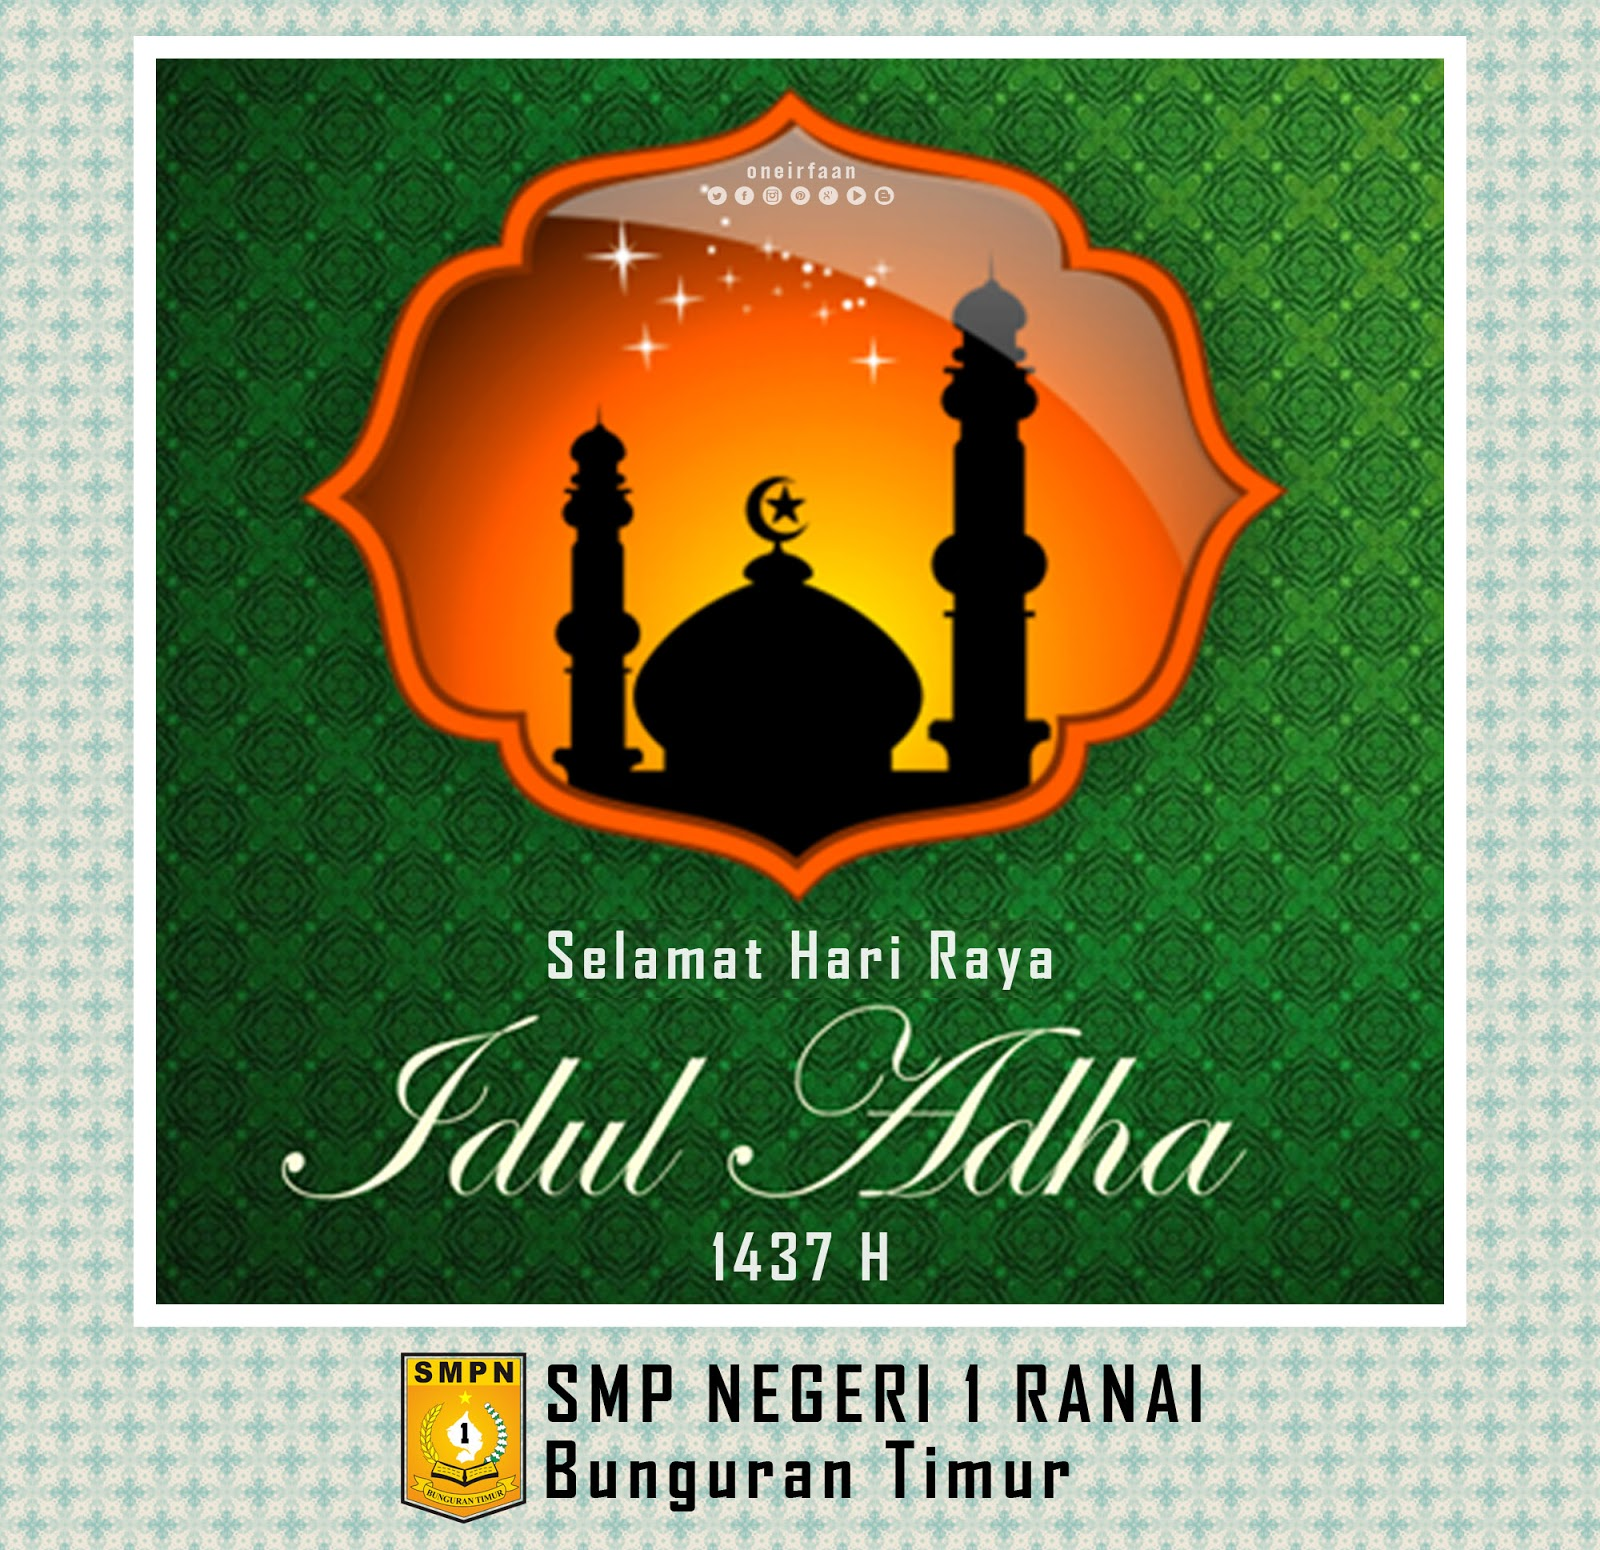 Desain Hari Raya Idul Adha 1437 H